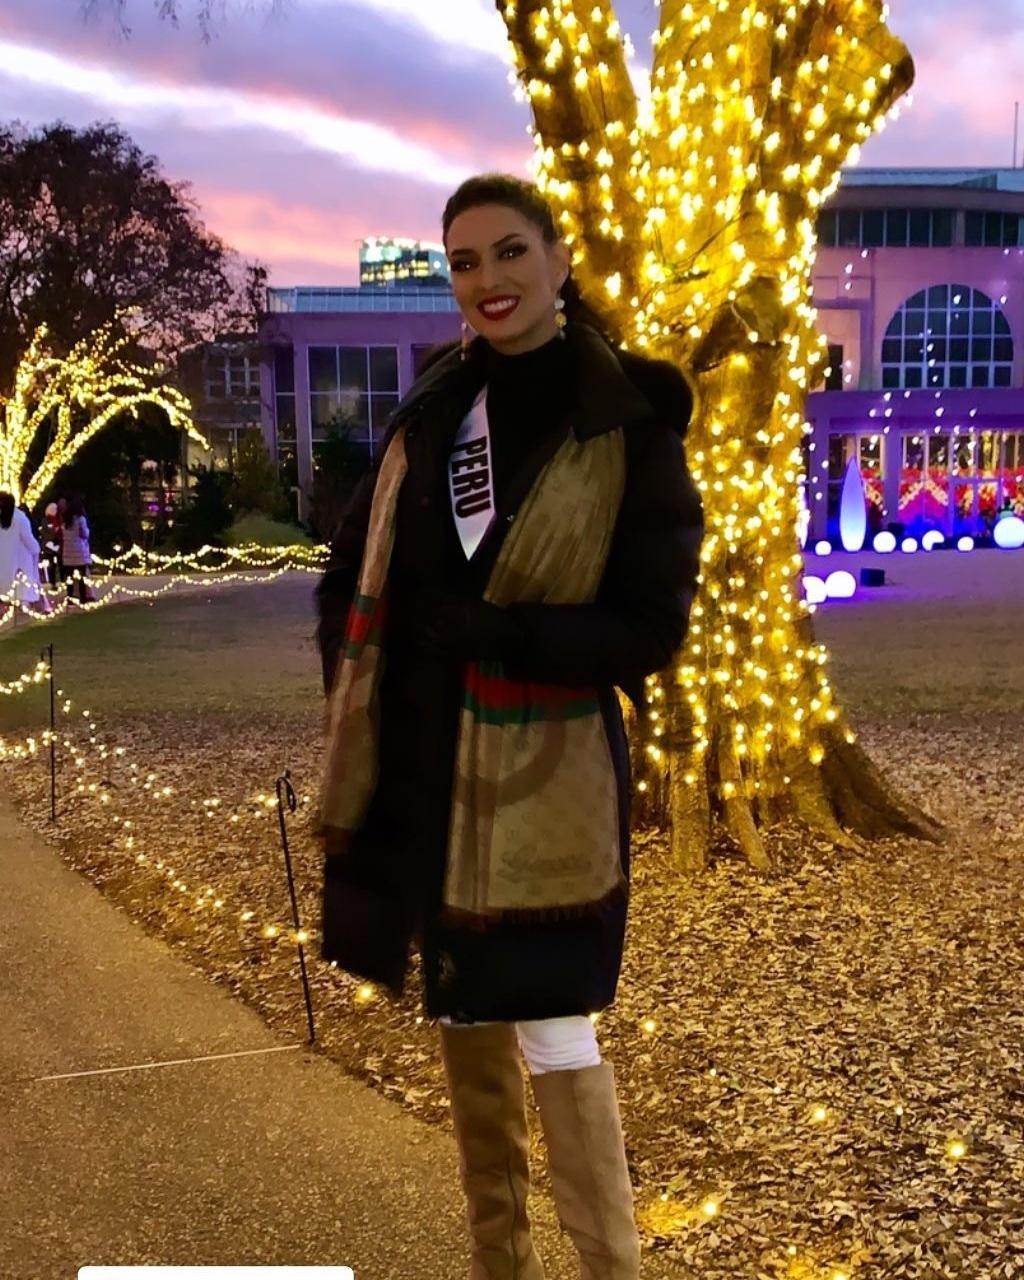 kelin rivera kroll, top 10 de miss universe 2019/2nd runner-up de miss eco international 2018/world miss university 2016. - Página 16 75210414